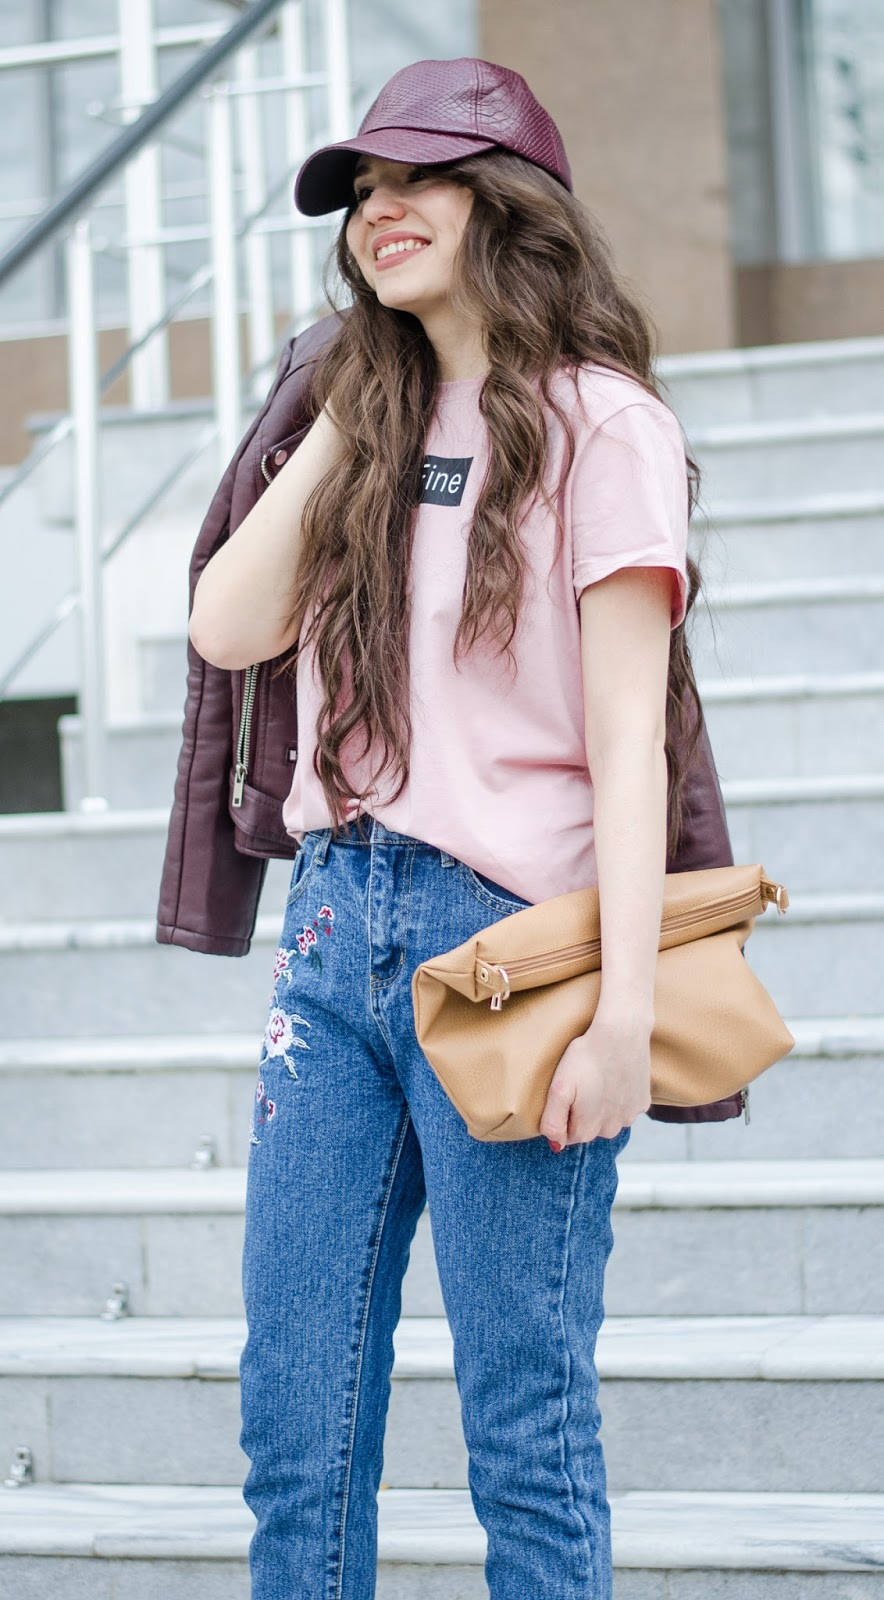 fashion blogger diyorasnotes diyora beta jeans with embroidery pink shirt leather jacket zara slippers